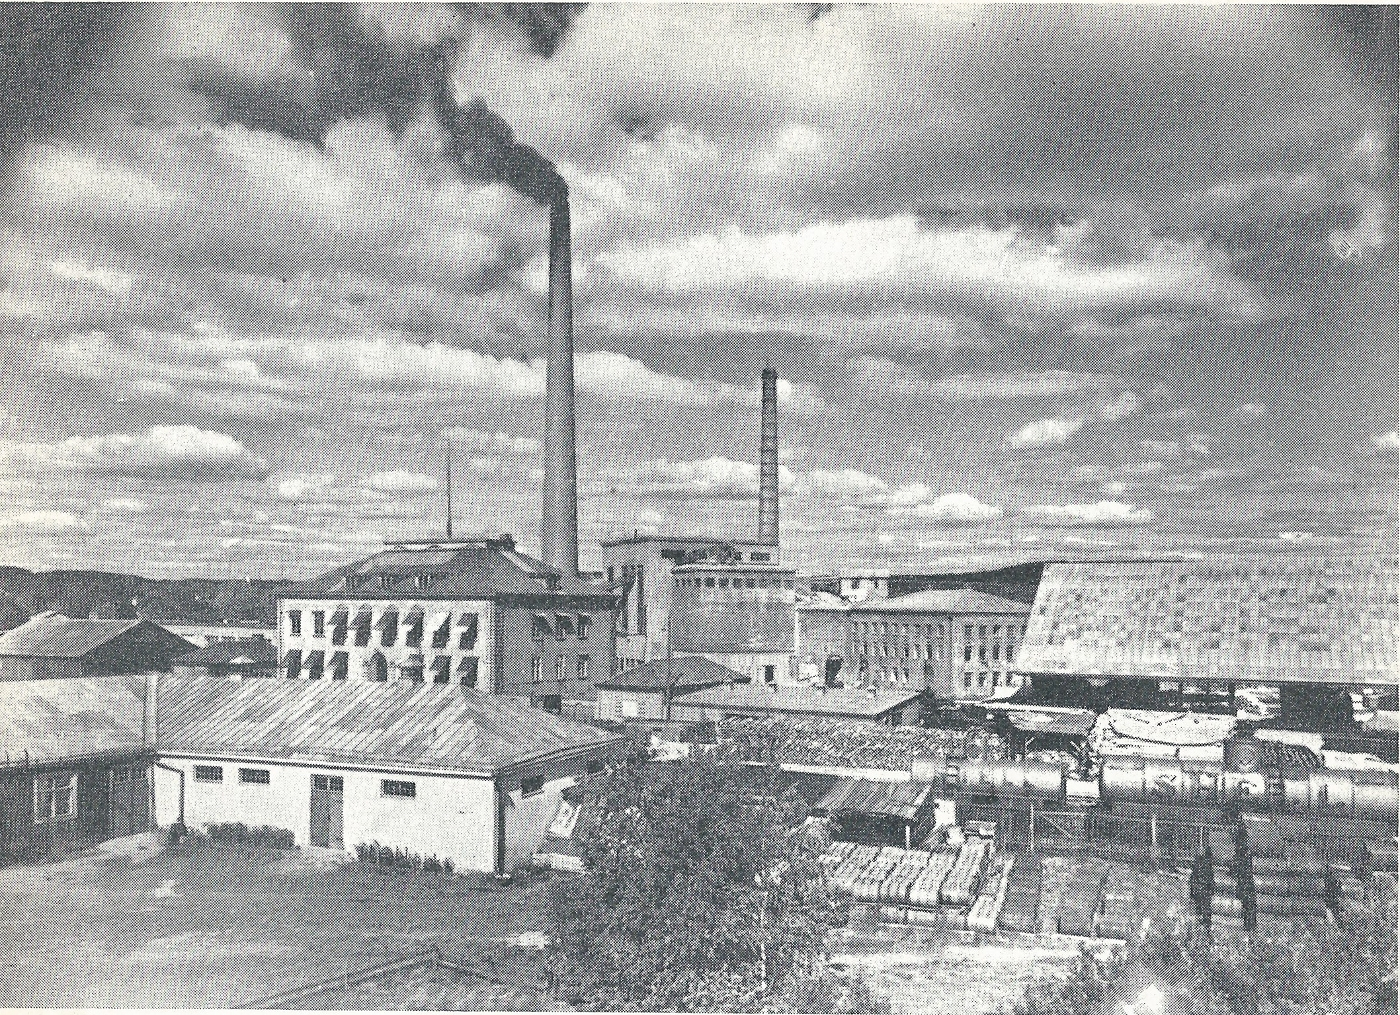 FileSchauman Plywood Factory Pre 1950